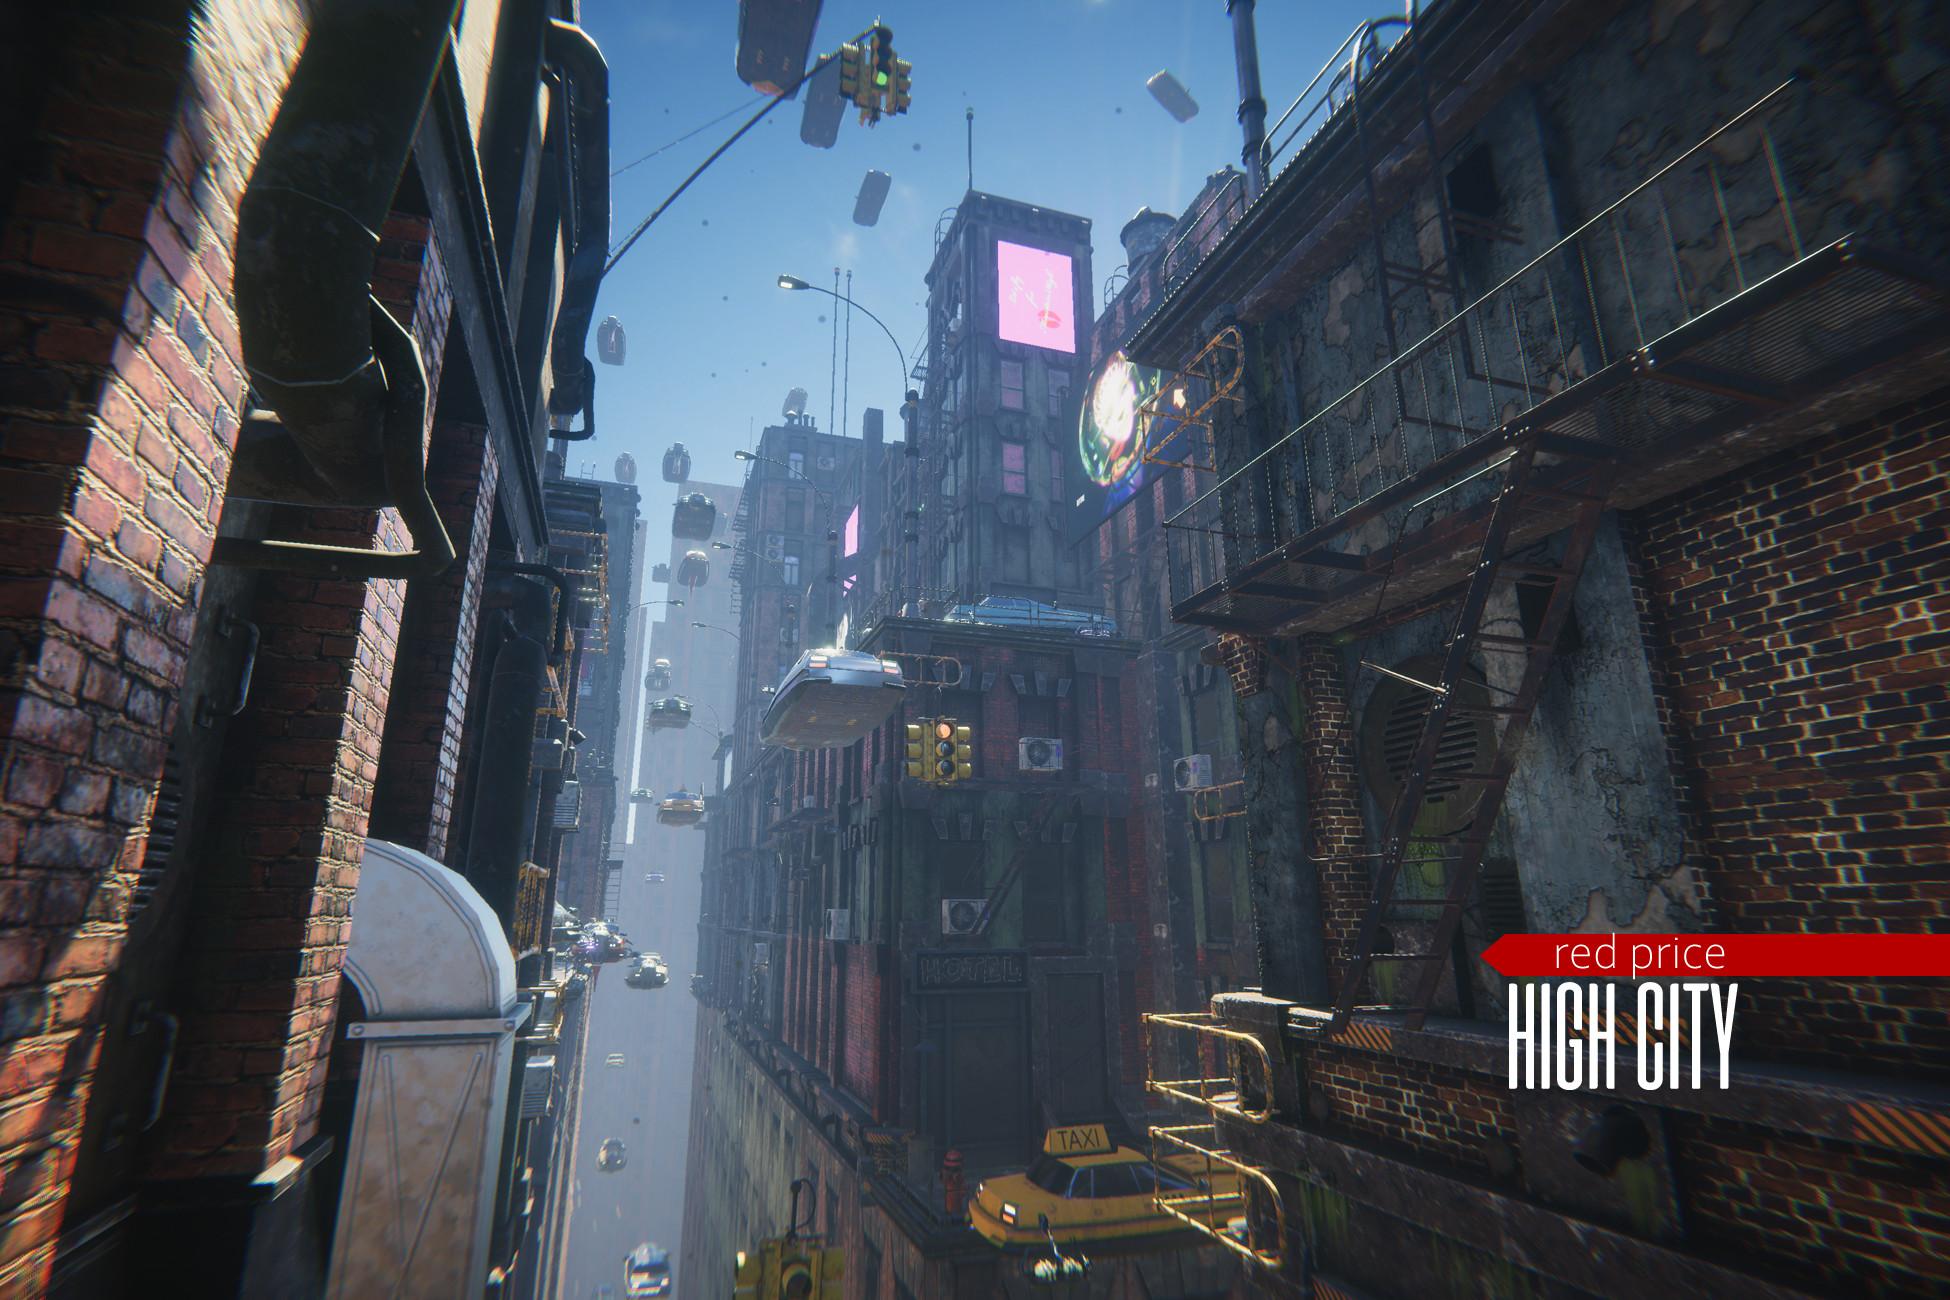 cyberpunk - High City